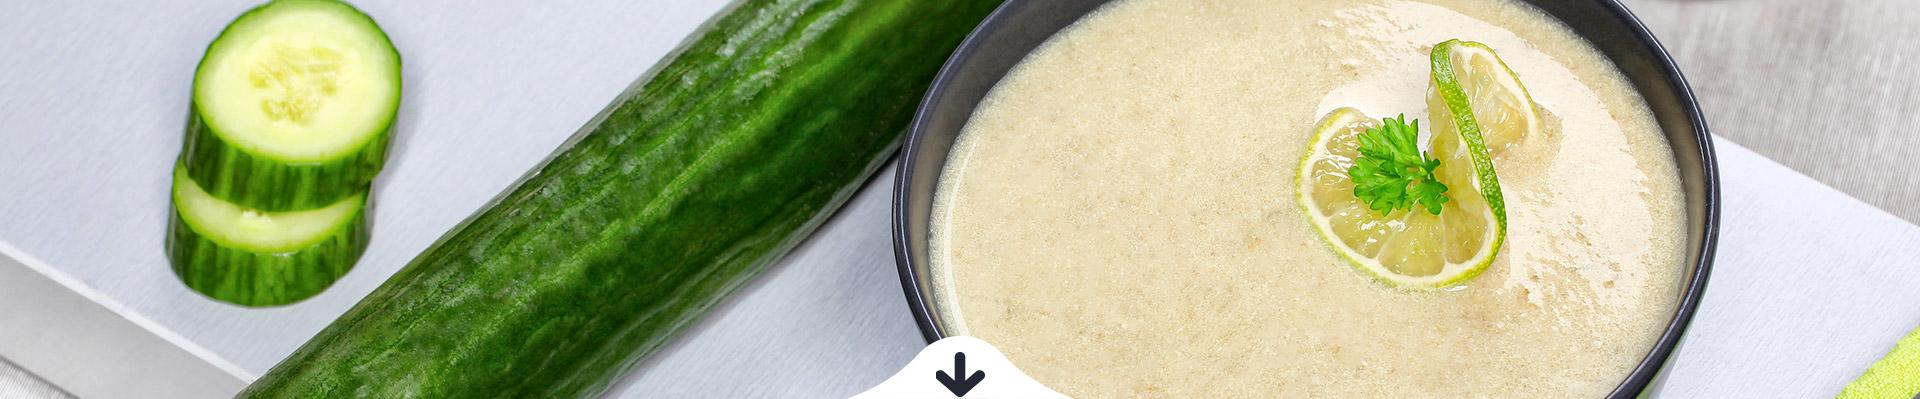 JÓLENNI FREE Hideg lime-os uborka krémleves